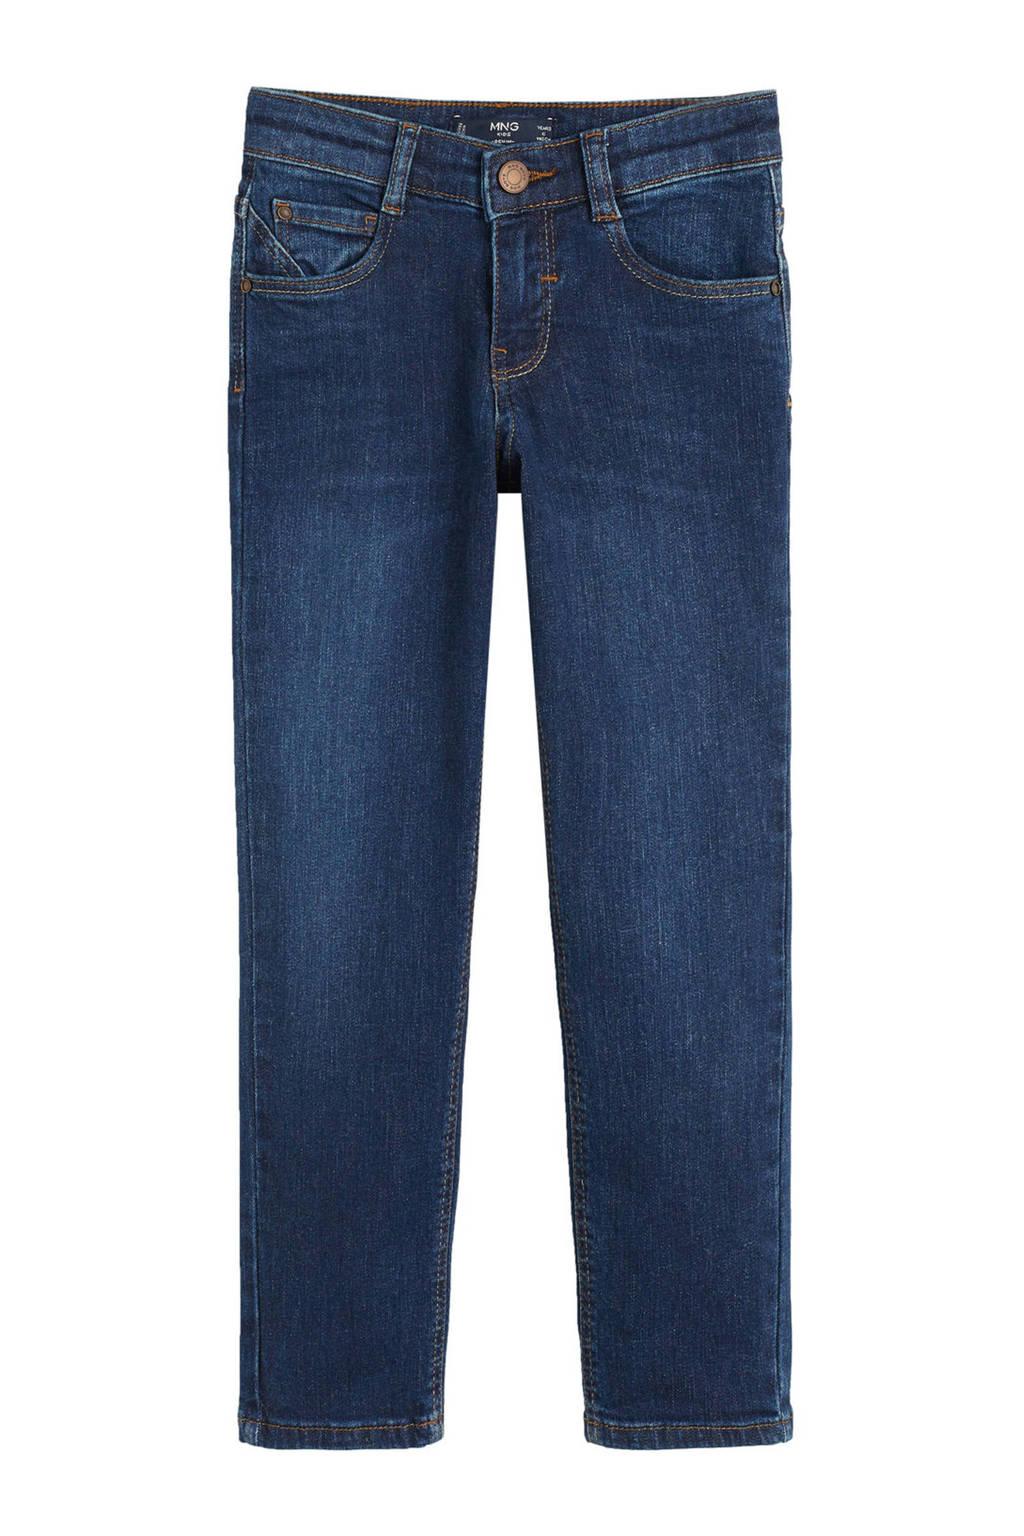 Mango Kids regular fit jeans dark denim, Dark denim